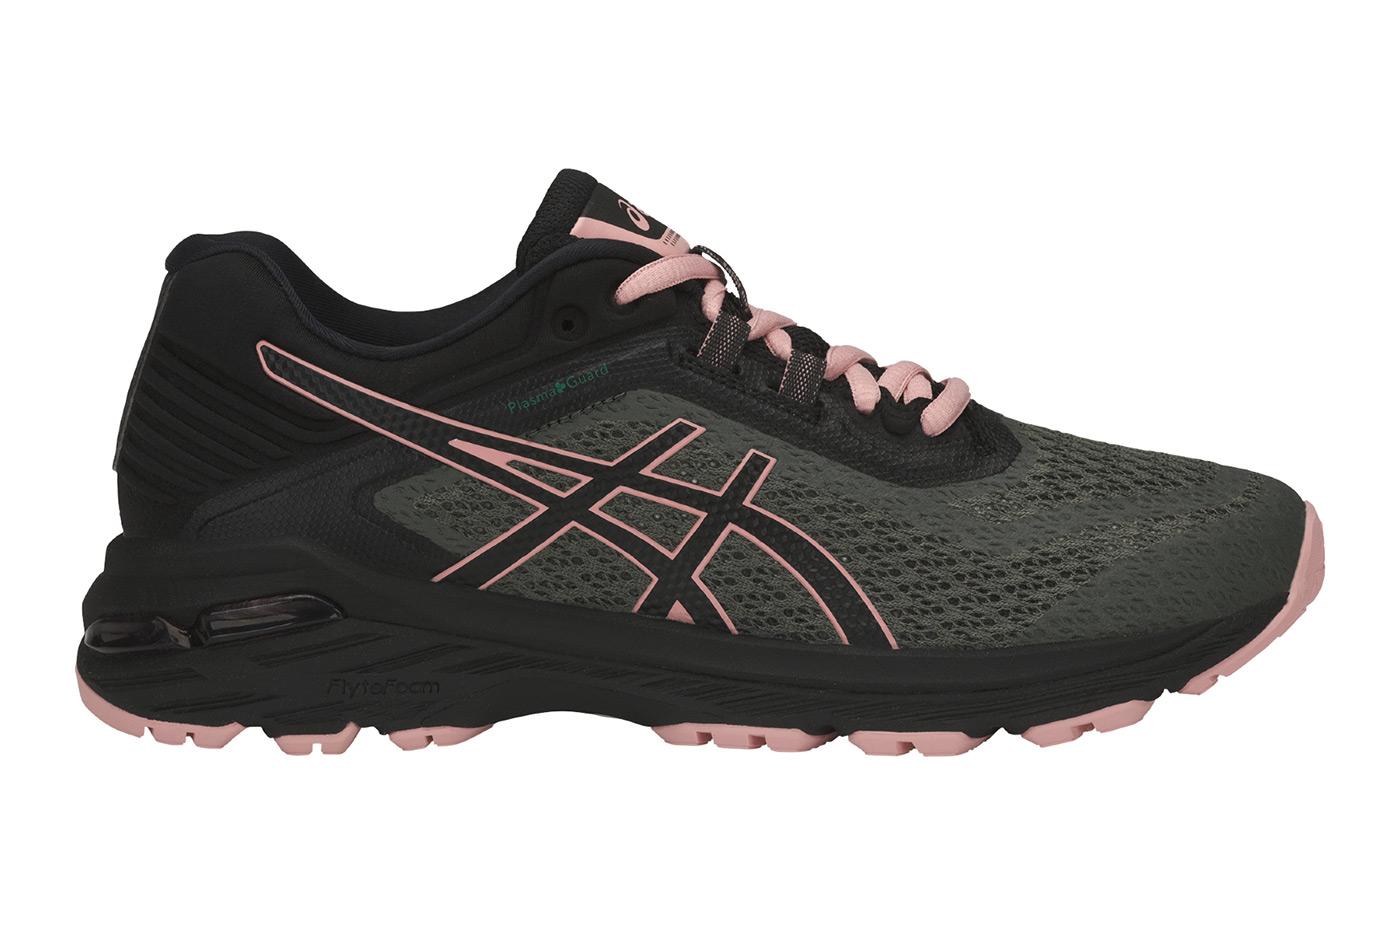 Chaussures Running Femme ASICS GT 2000 6 TRAIL PlasmaGuard 7Camo